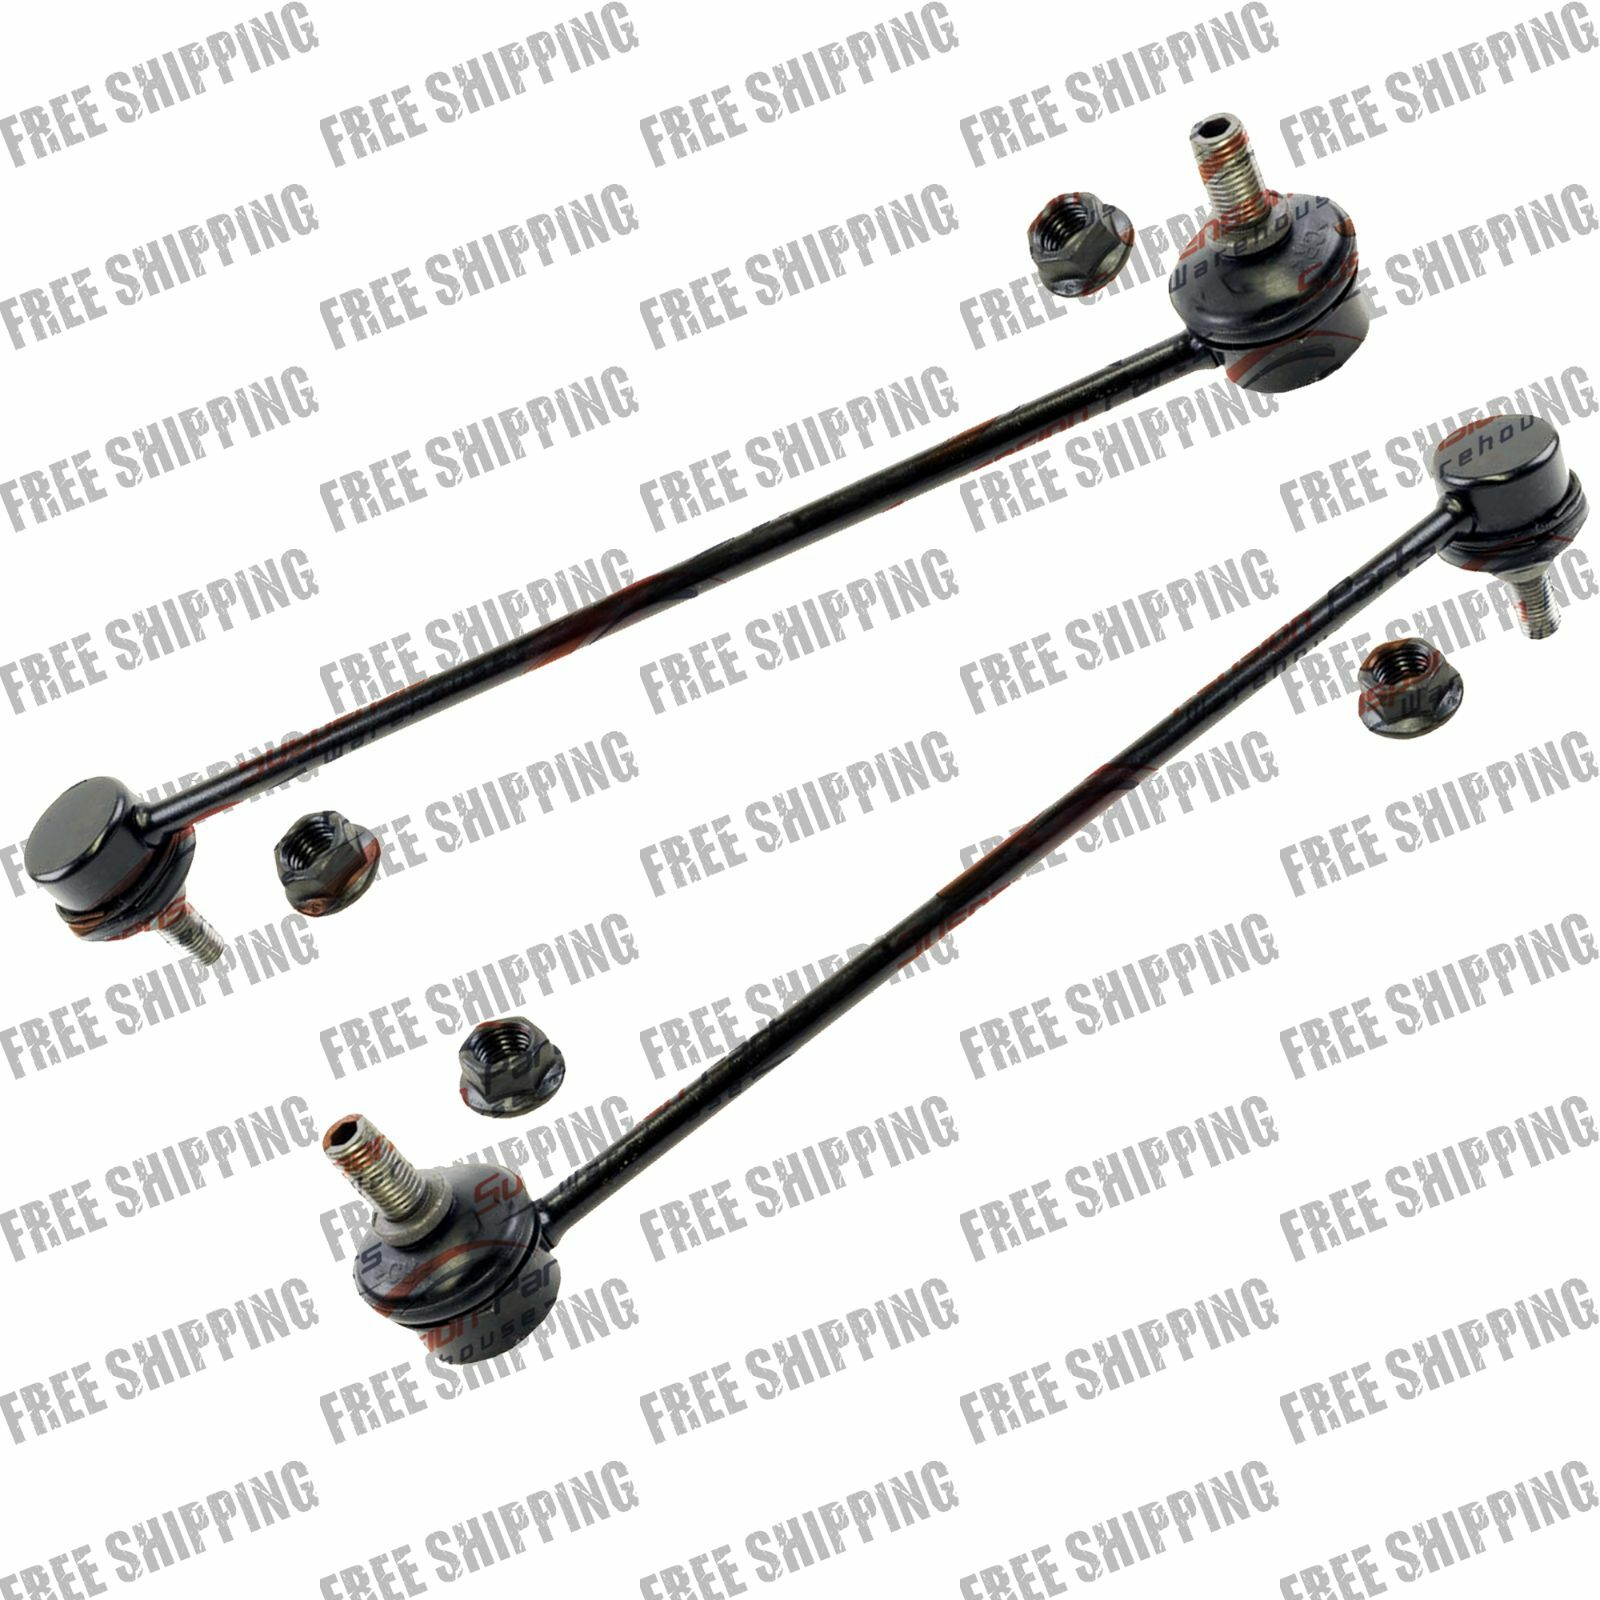 2 Stabilizer Sway Bar Mazda MPV, Protege 5, Dodge Caliber